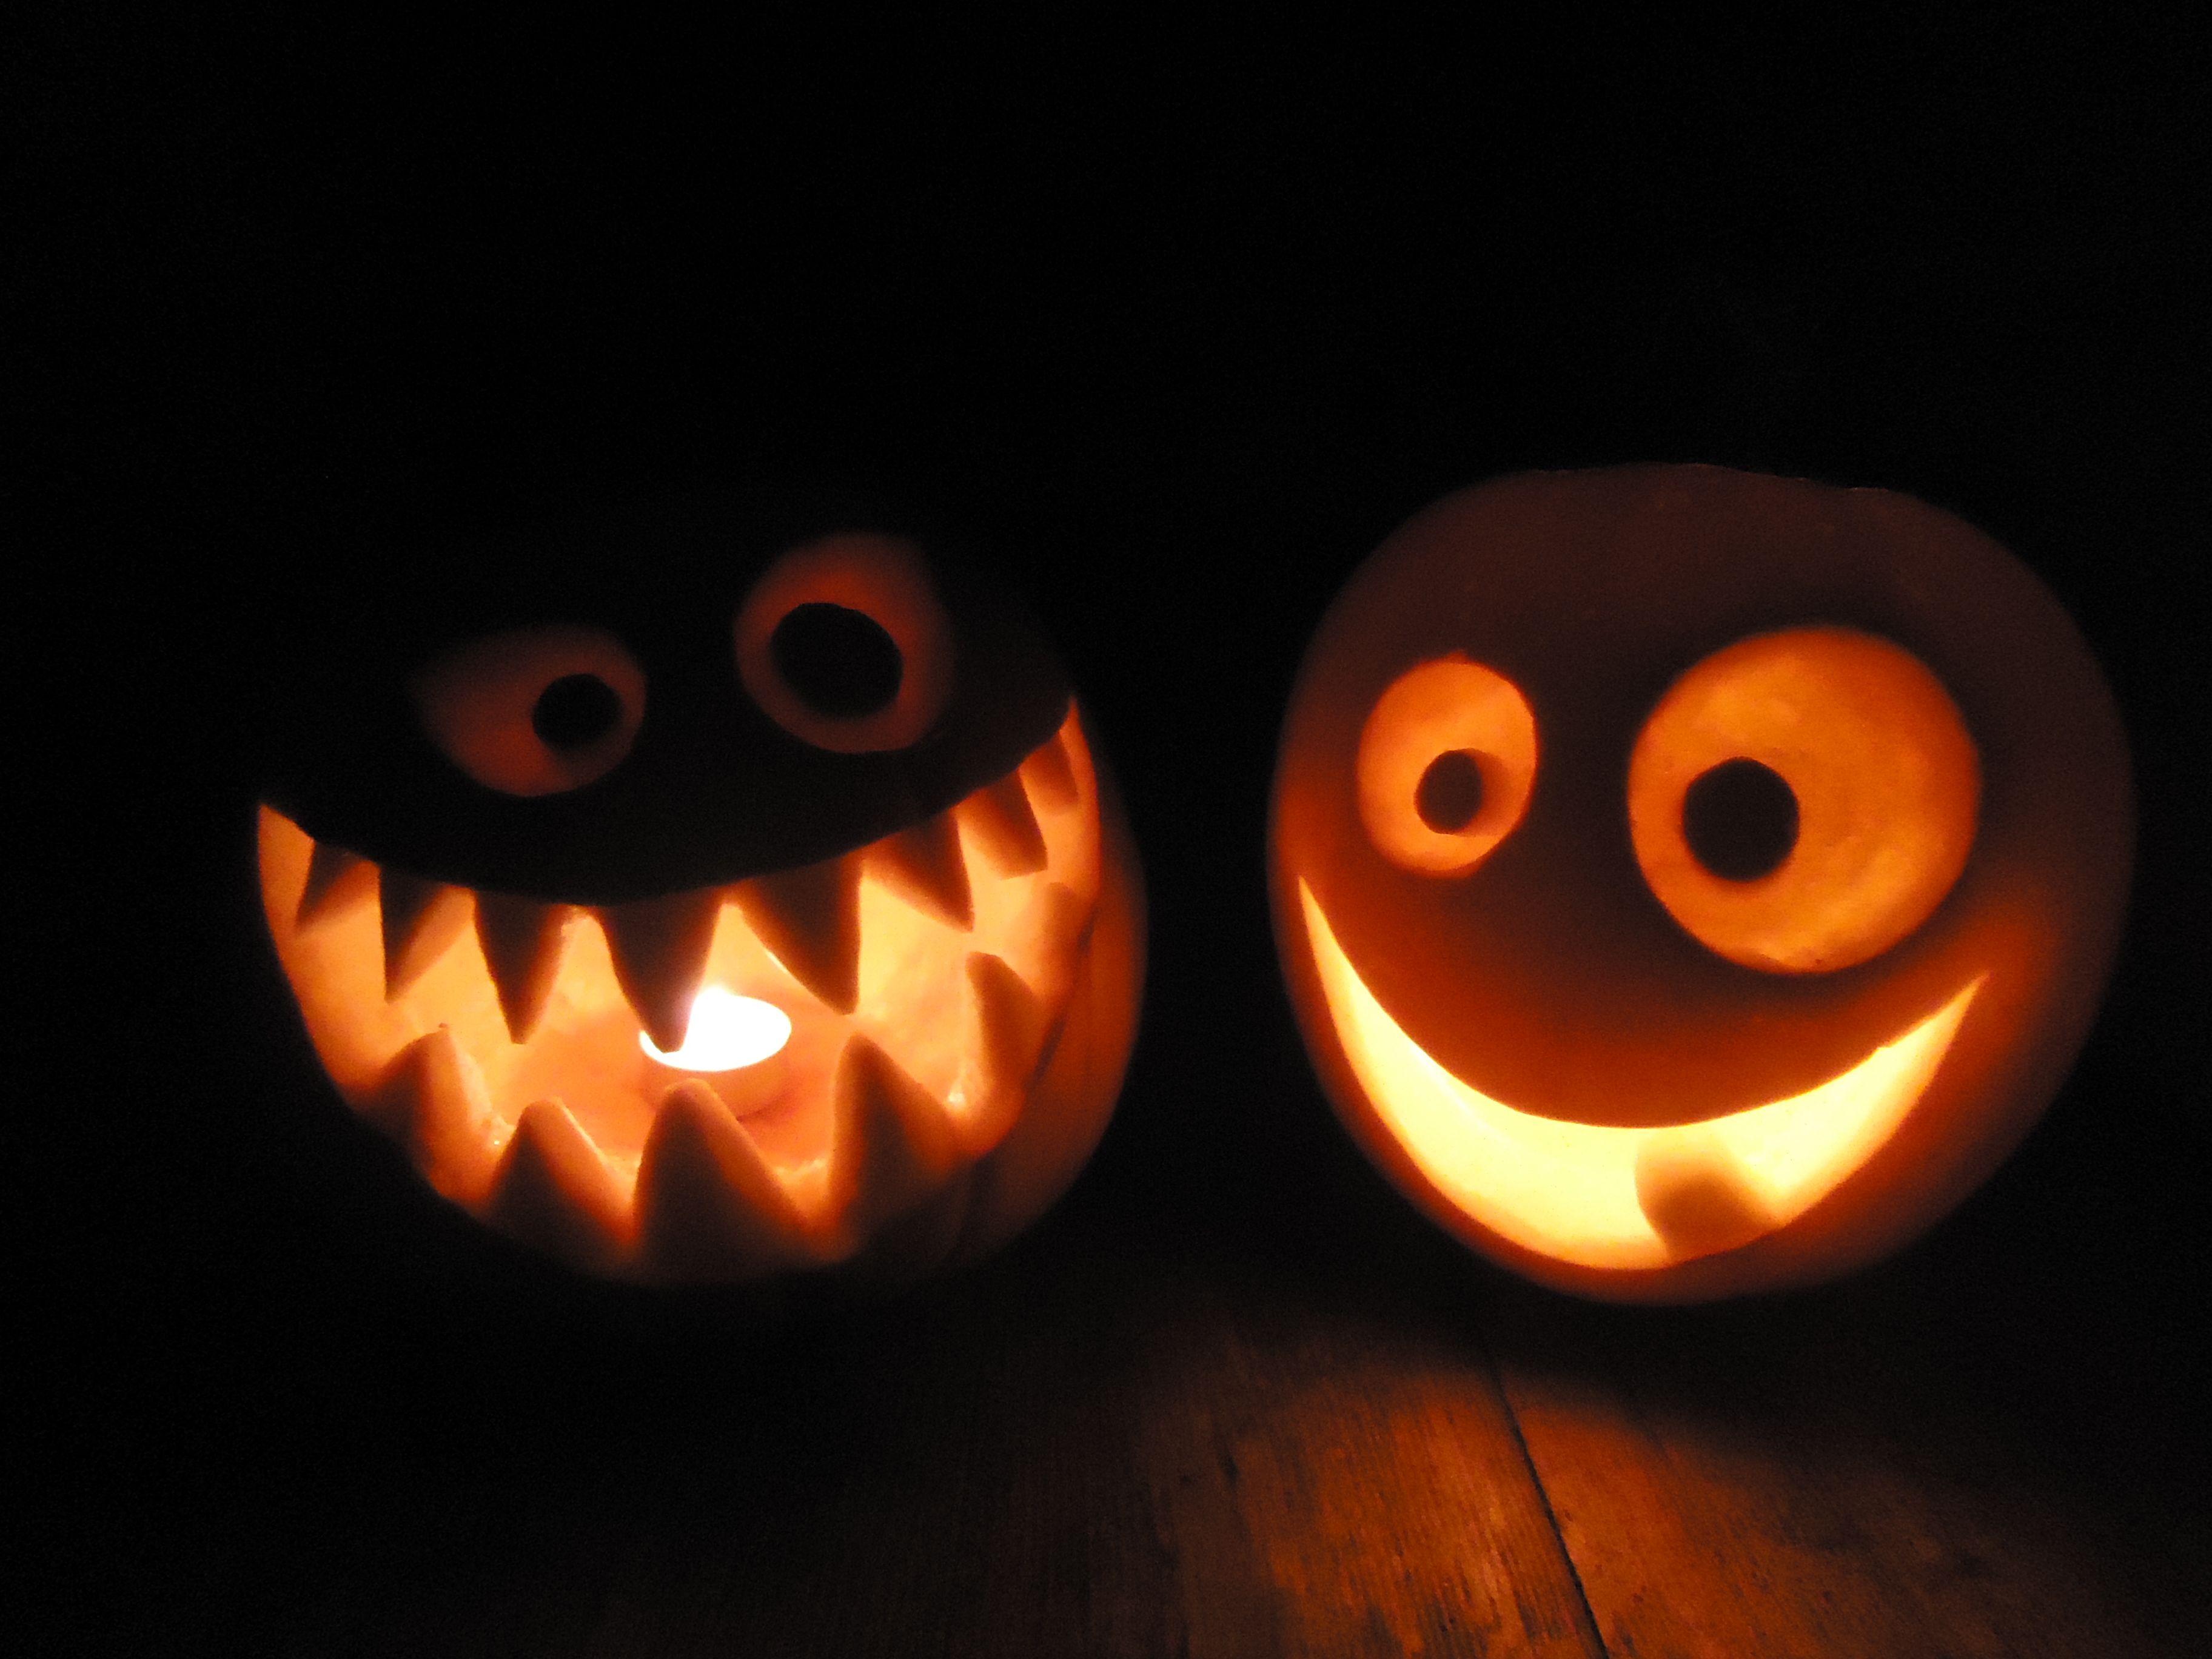 Spooky Silly Pumpkin Carvings Halloween Light Craft